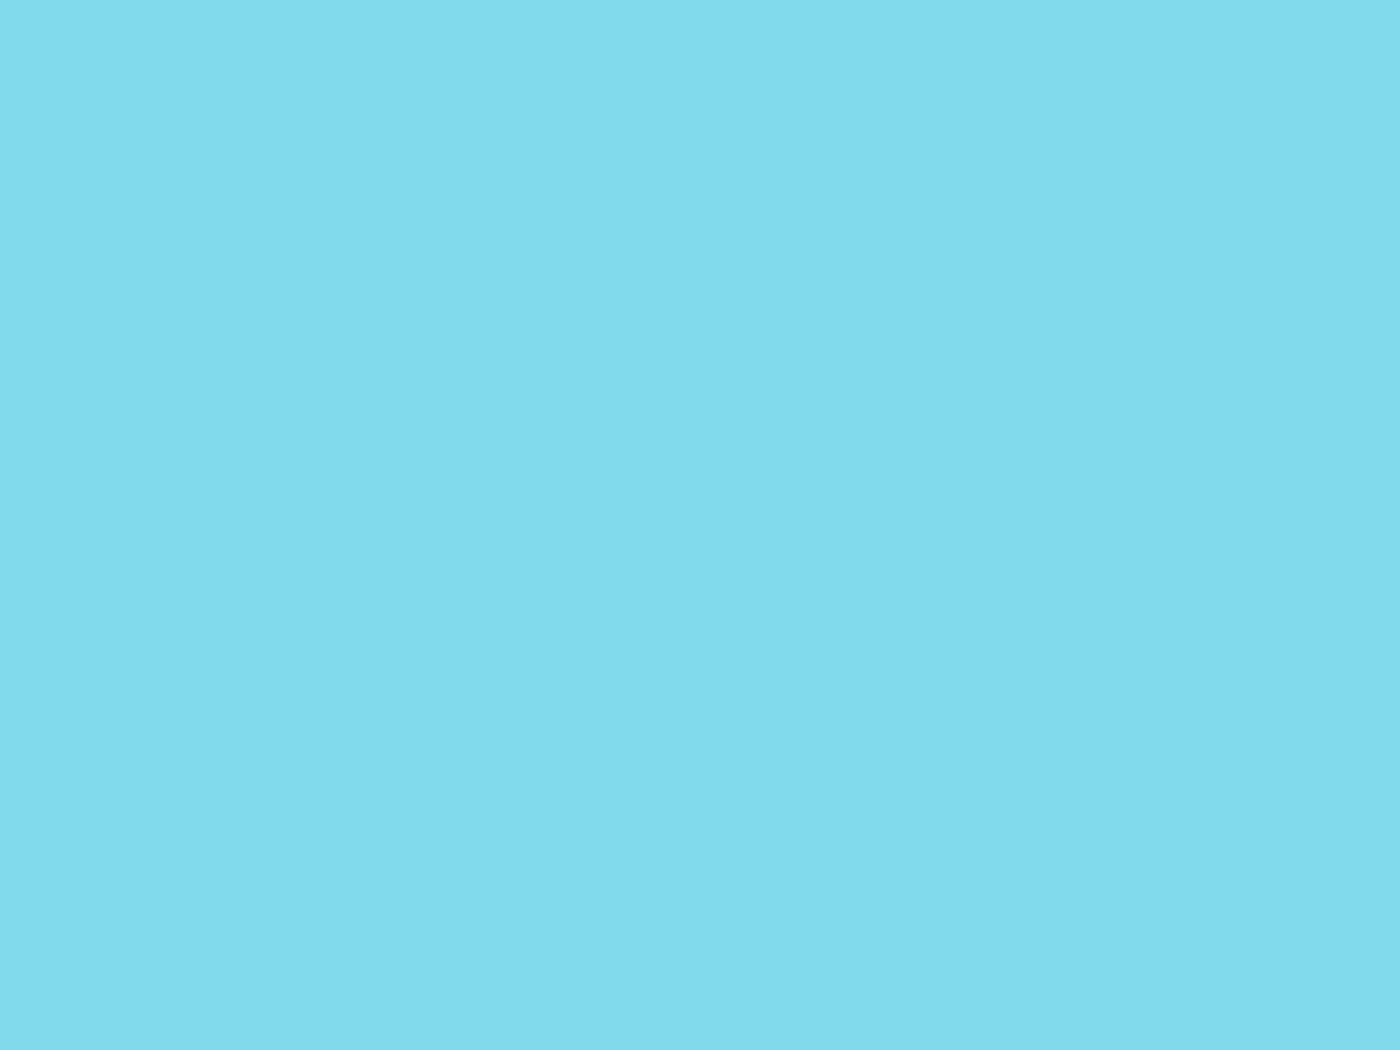 1400x1050 Medium Sky Blue Solid Color Background